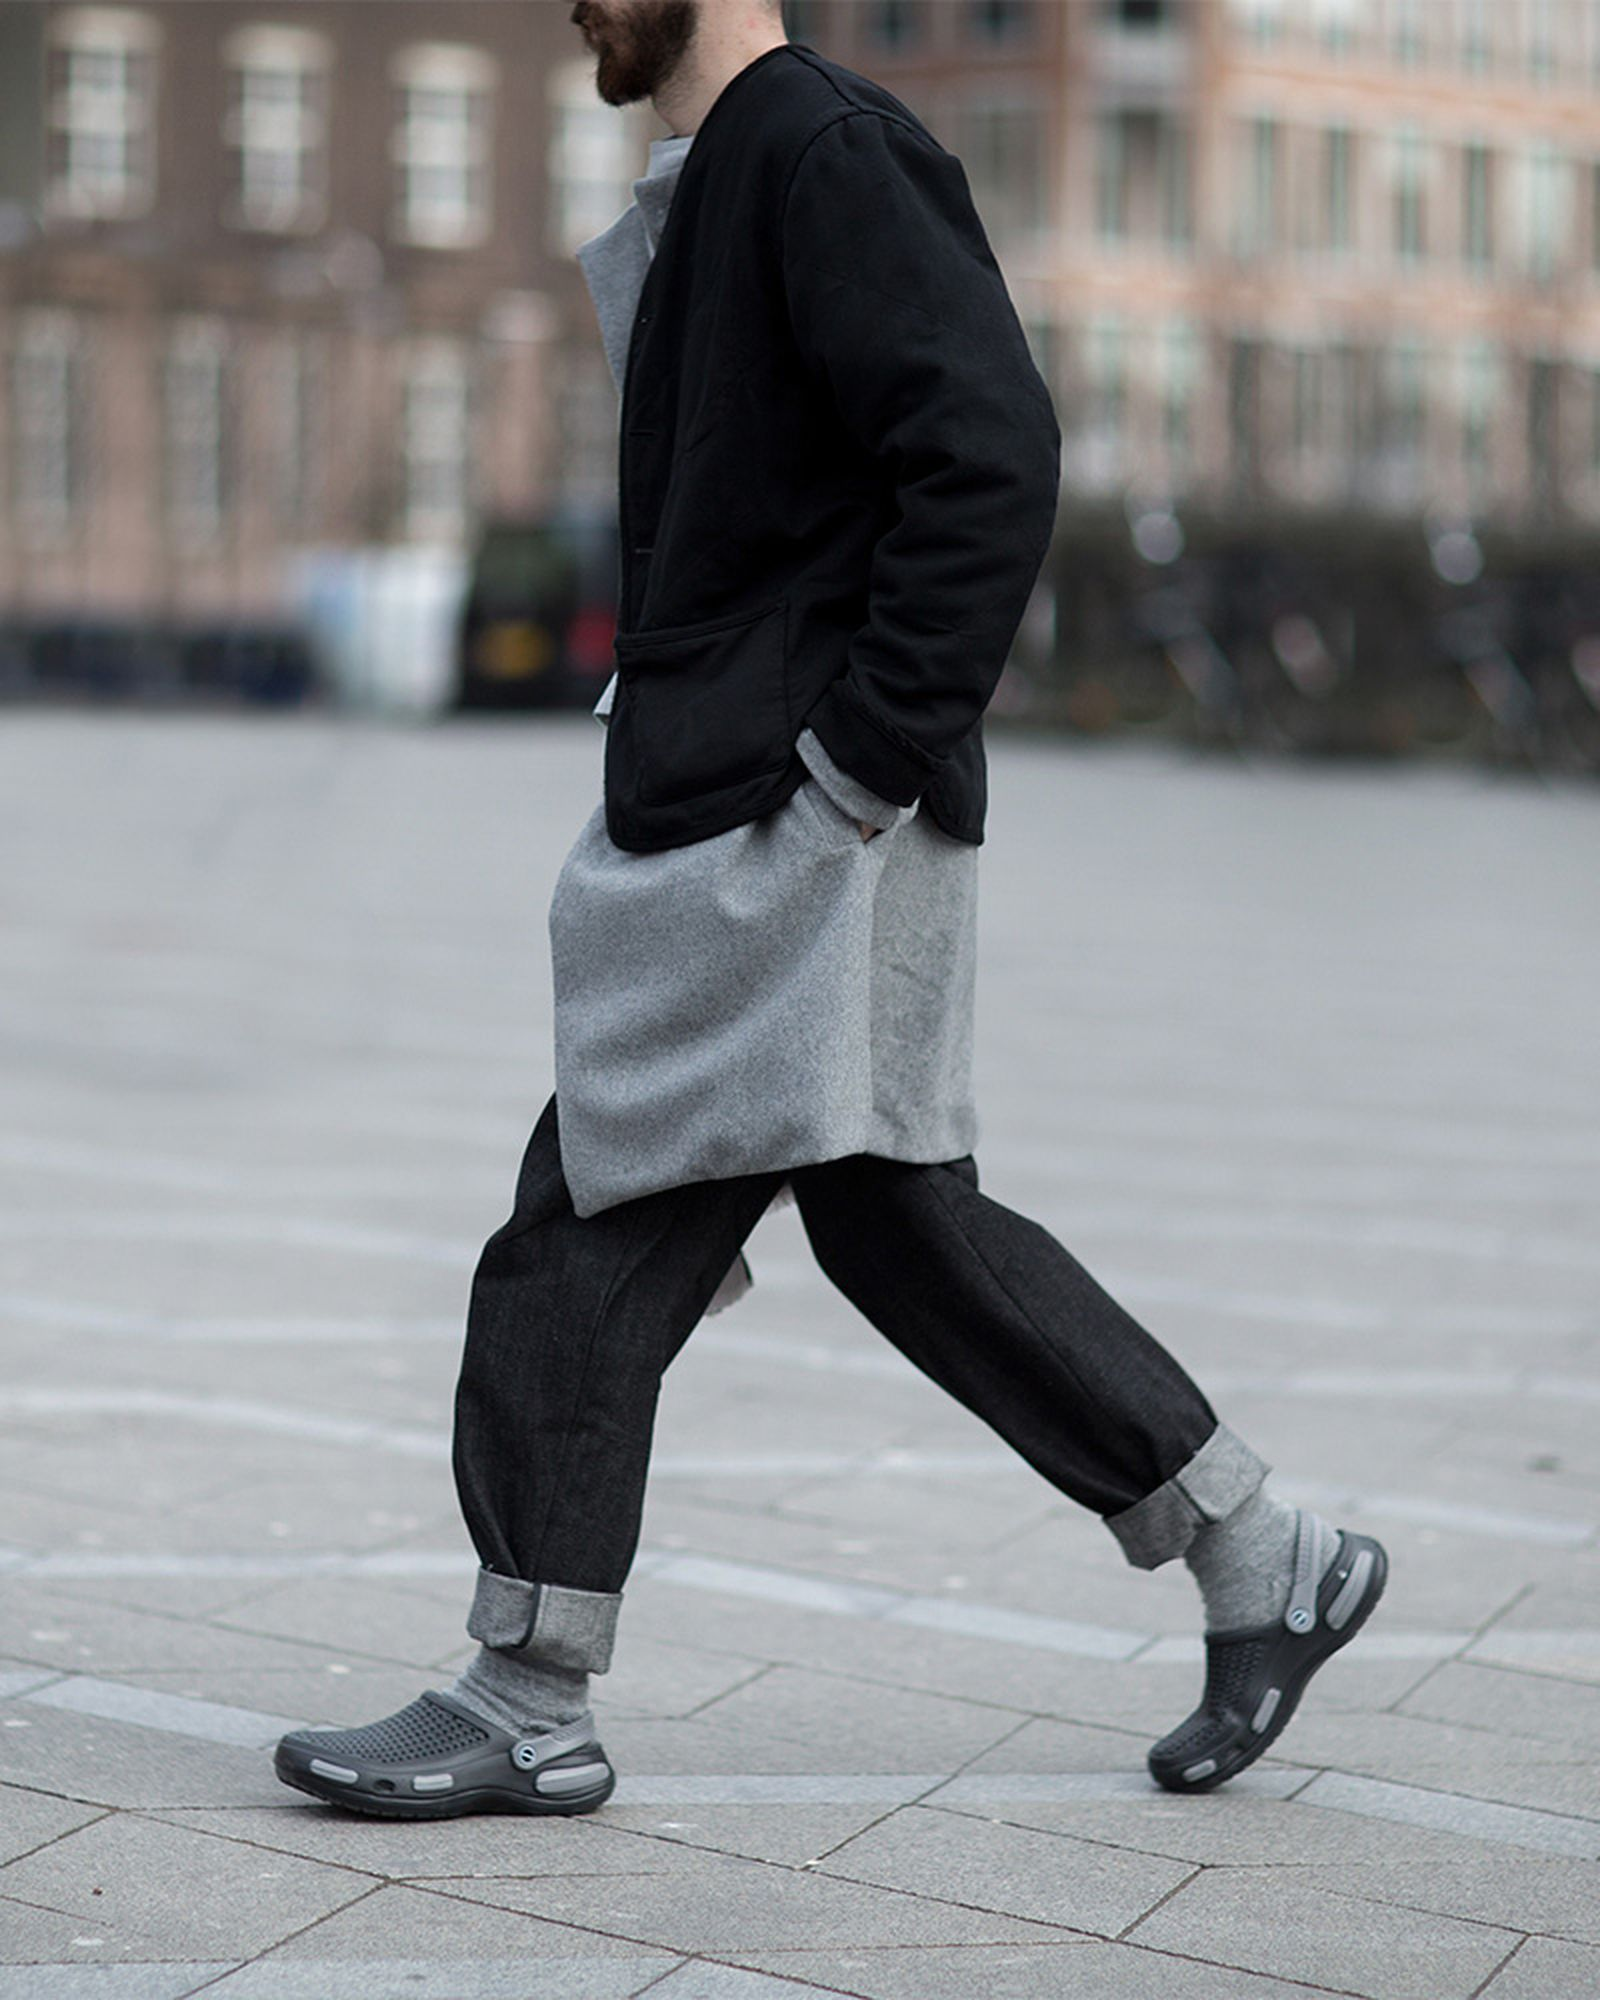 crocs divisive footwear 2018 alife pleasures